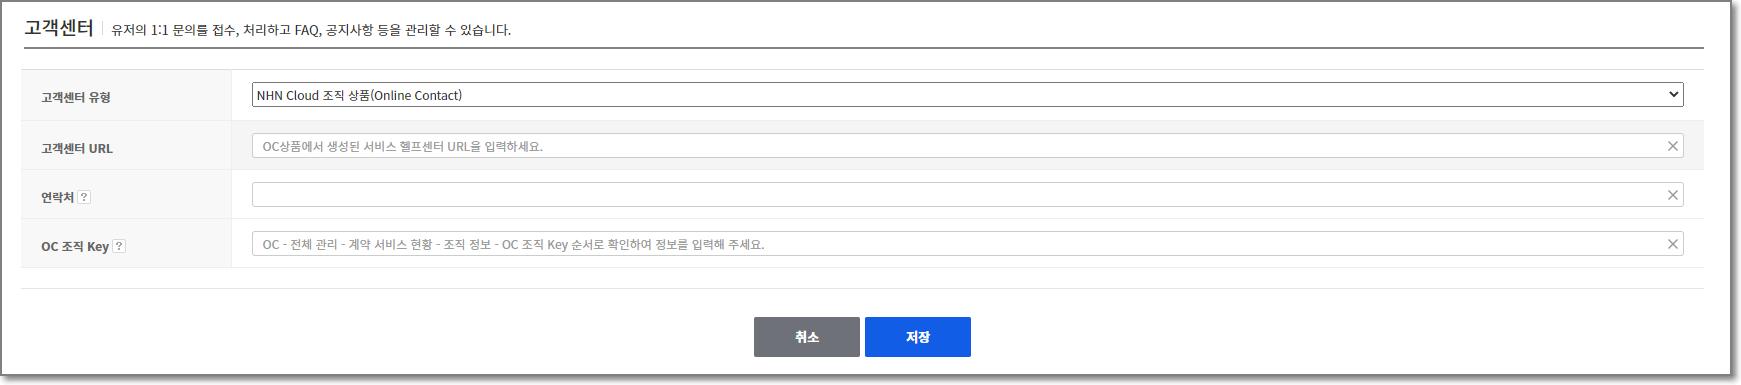 gamebase_app_21_202107.png